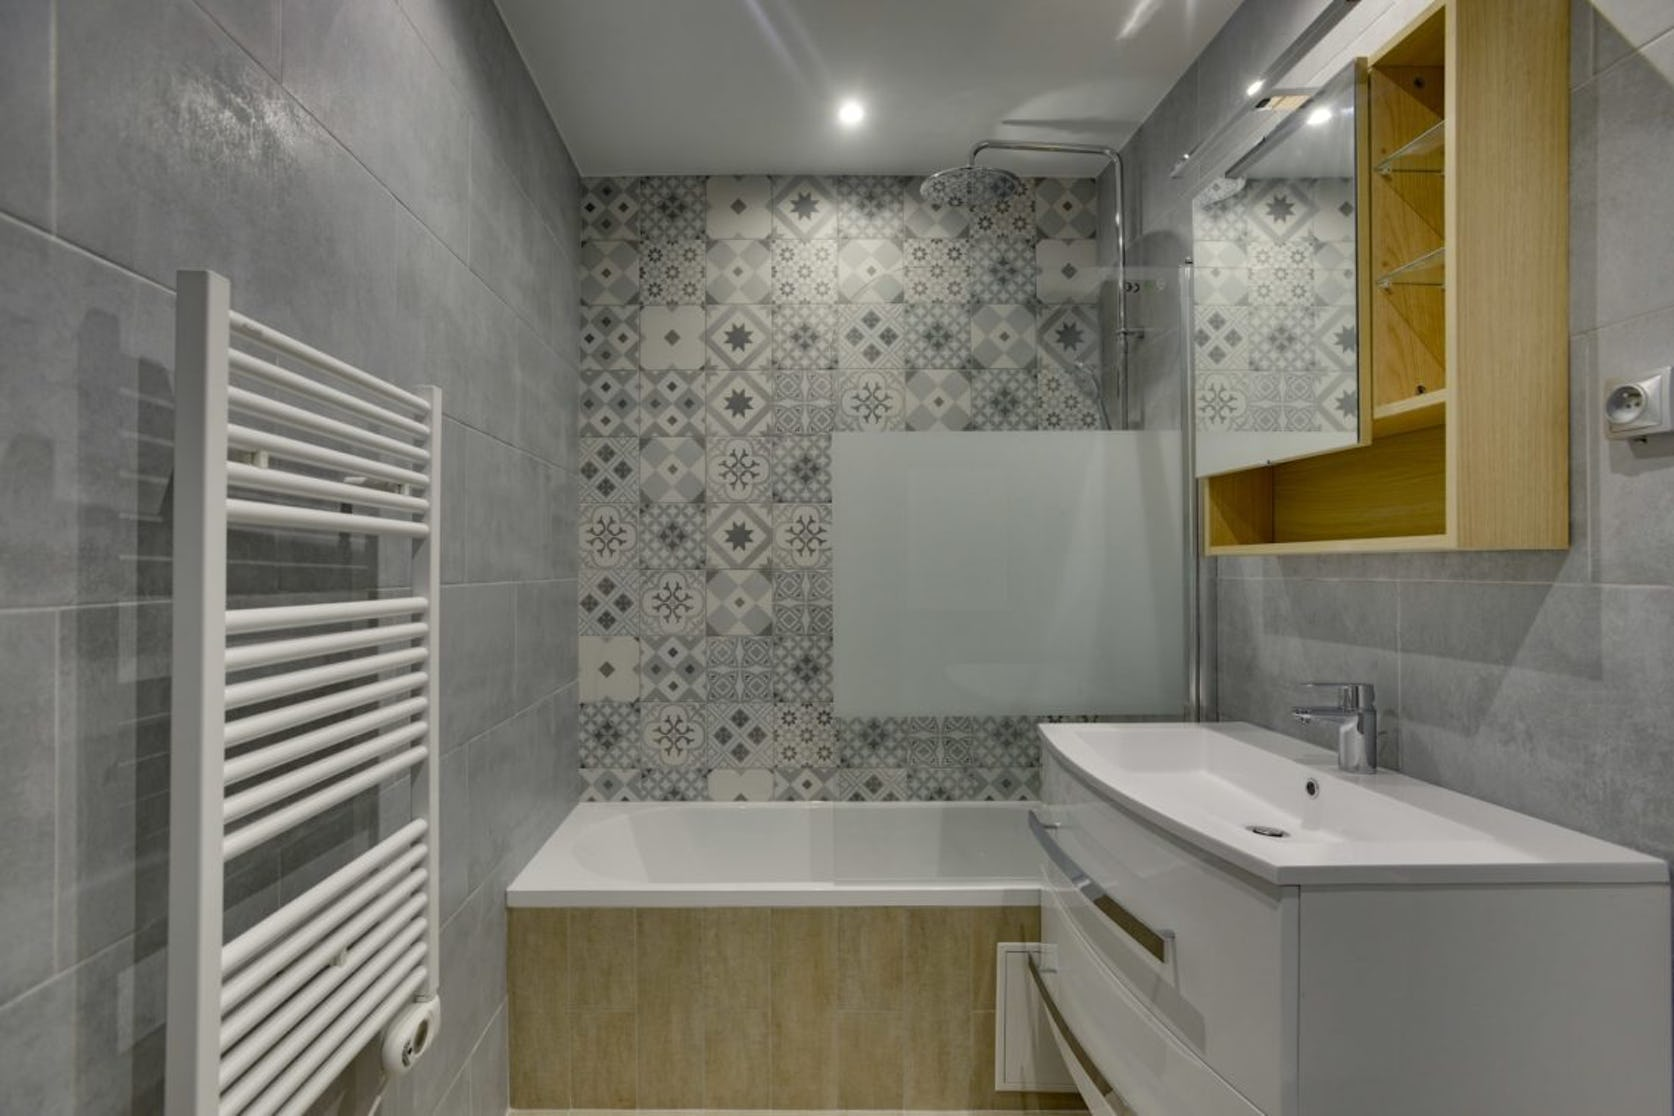 Carrelage mural, baignoire rectangulaire et vasque meuble.